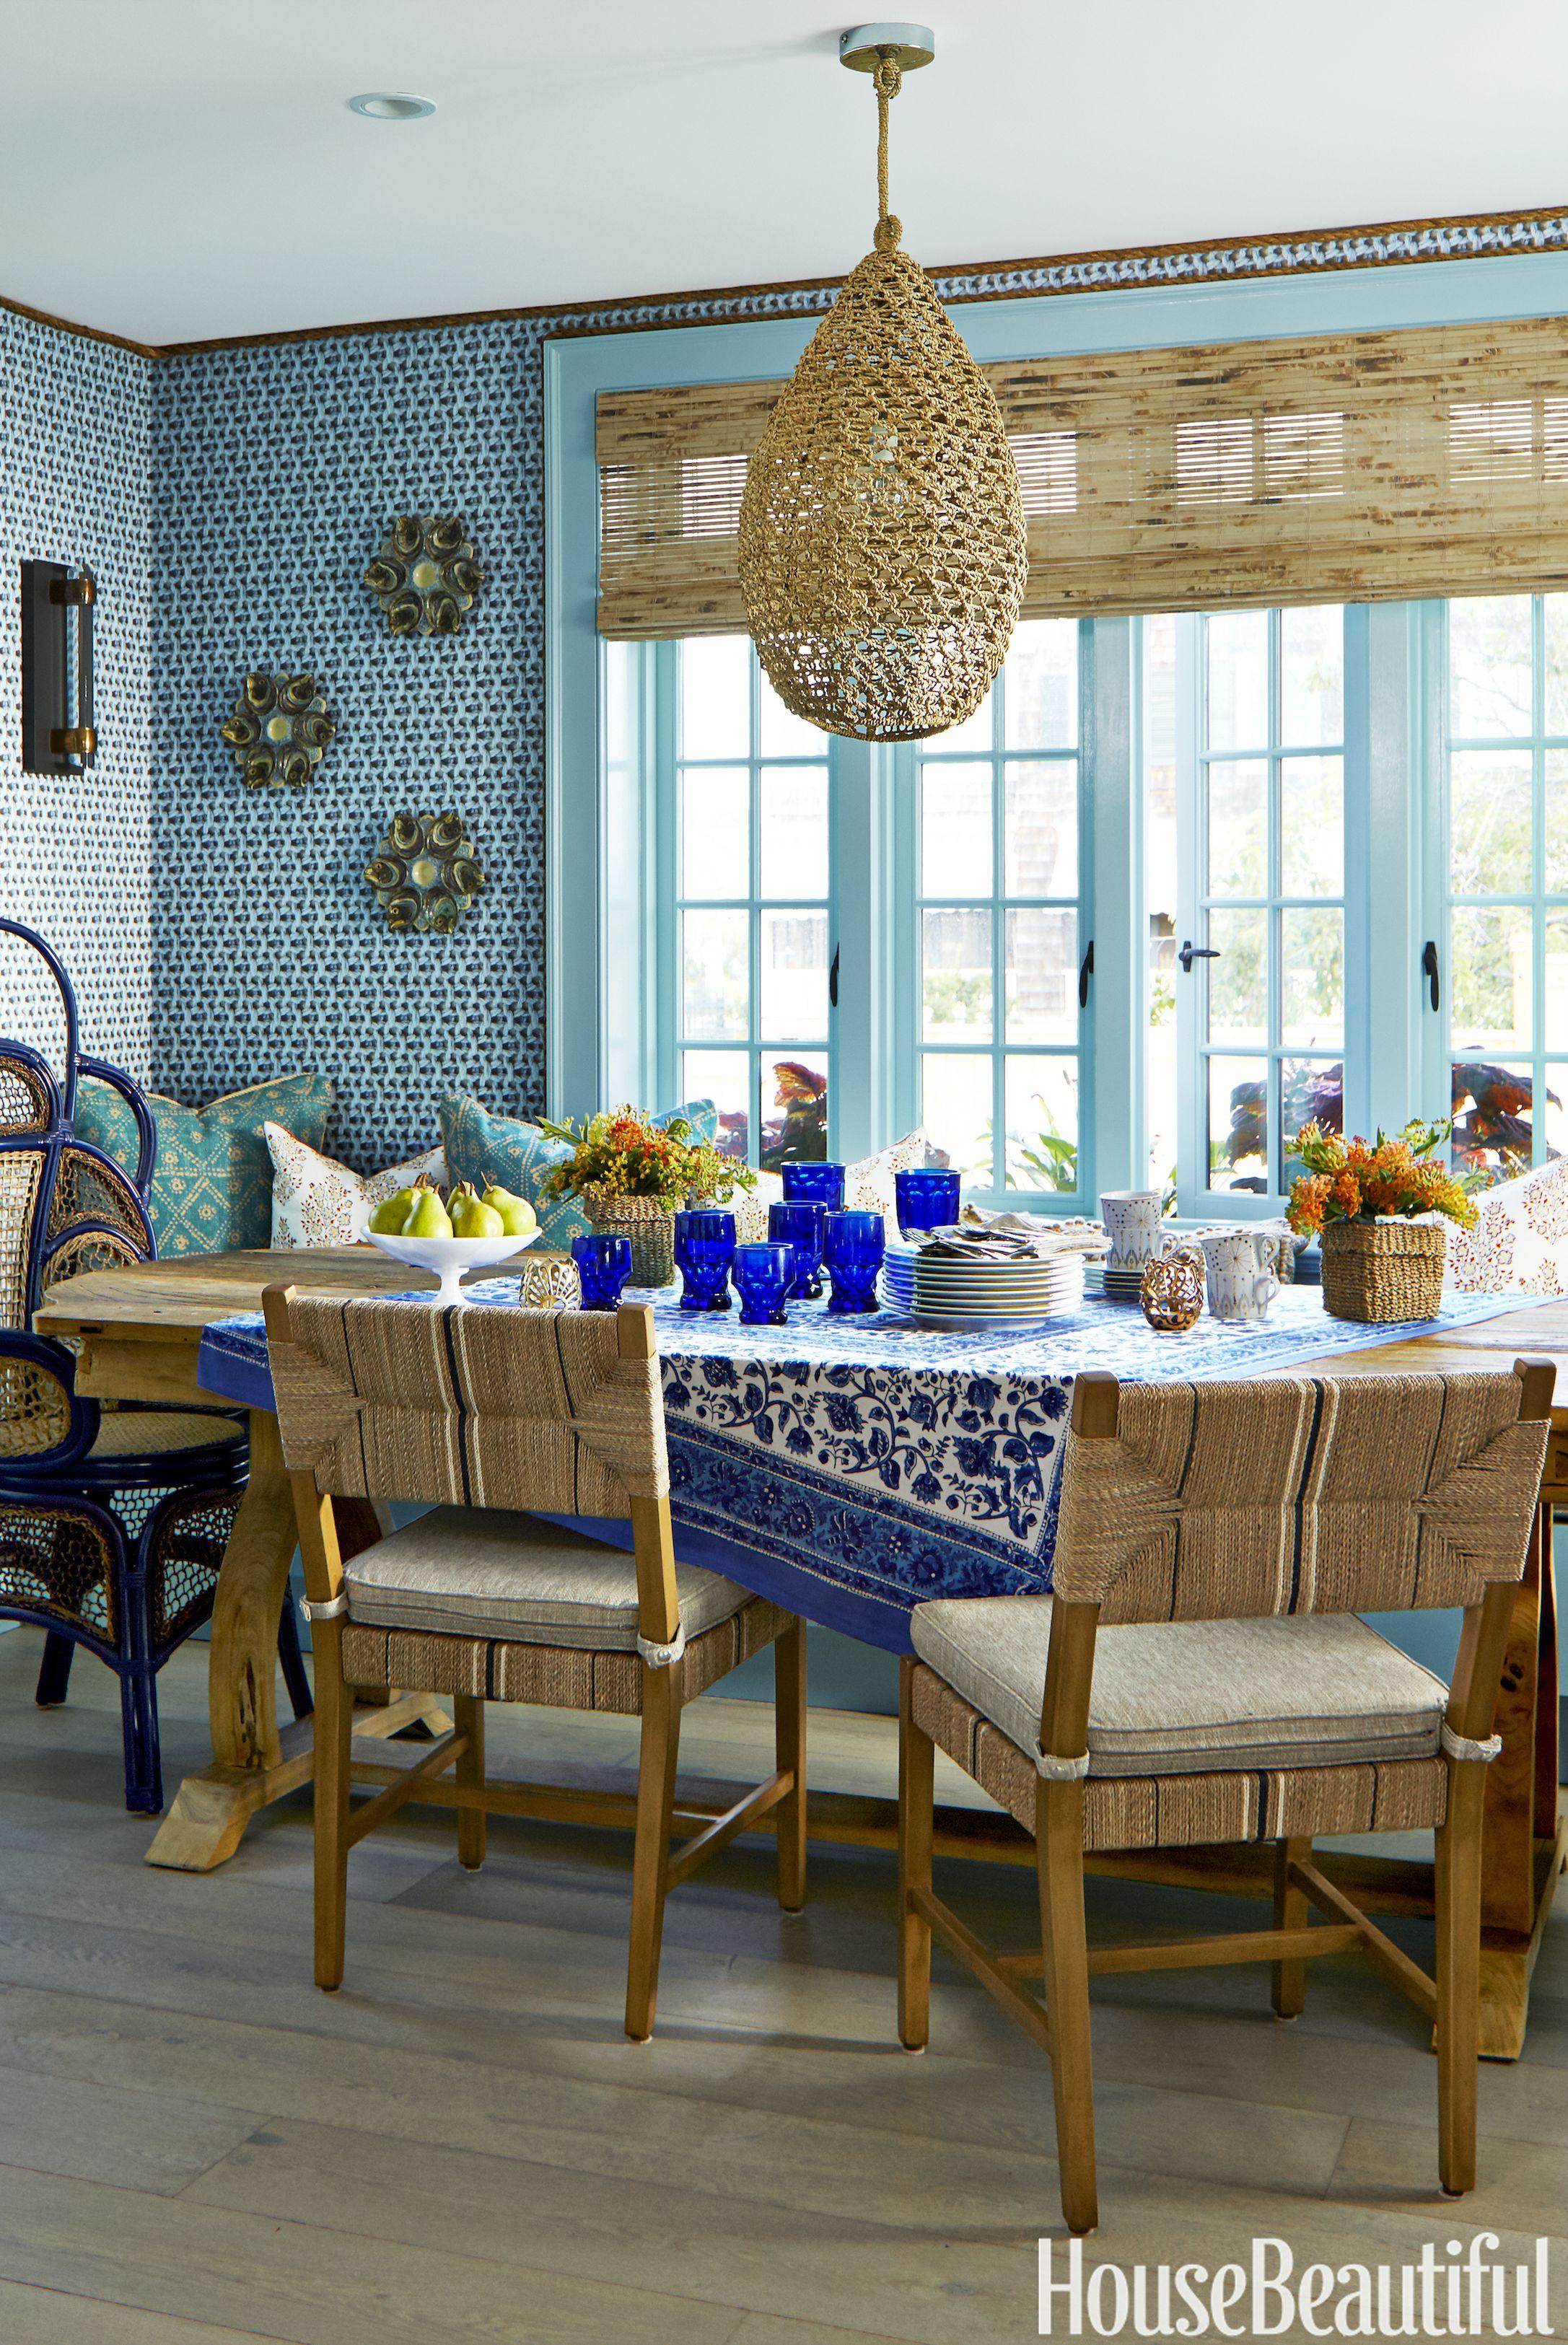 20 Bohemian Decor Ideas Boho Room Style Decorating And Inspiration